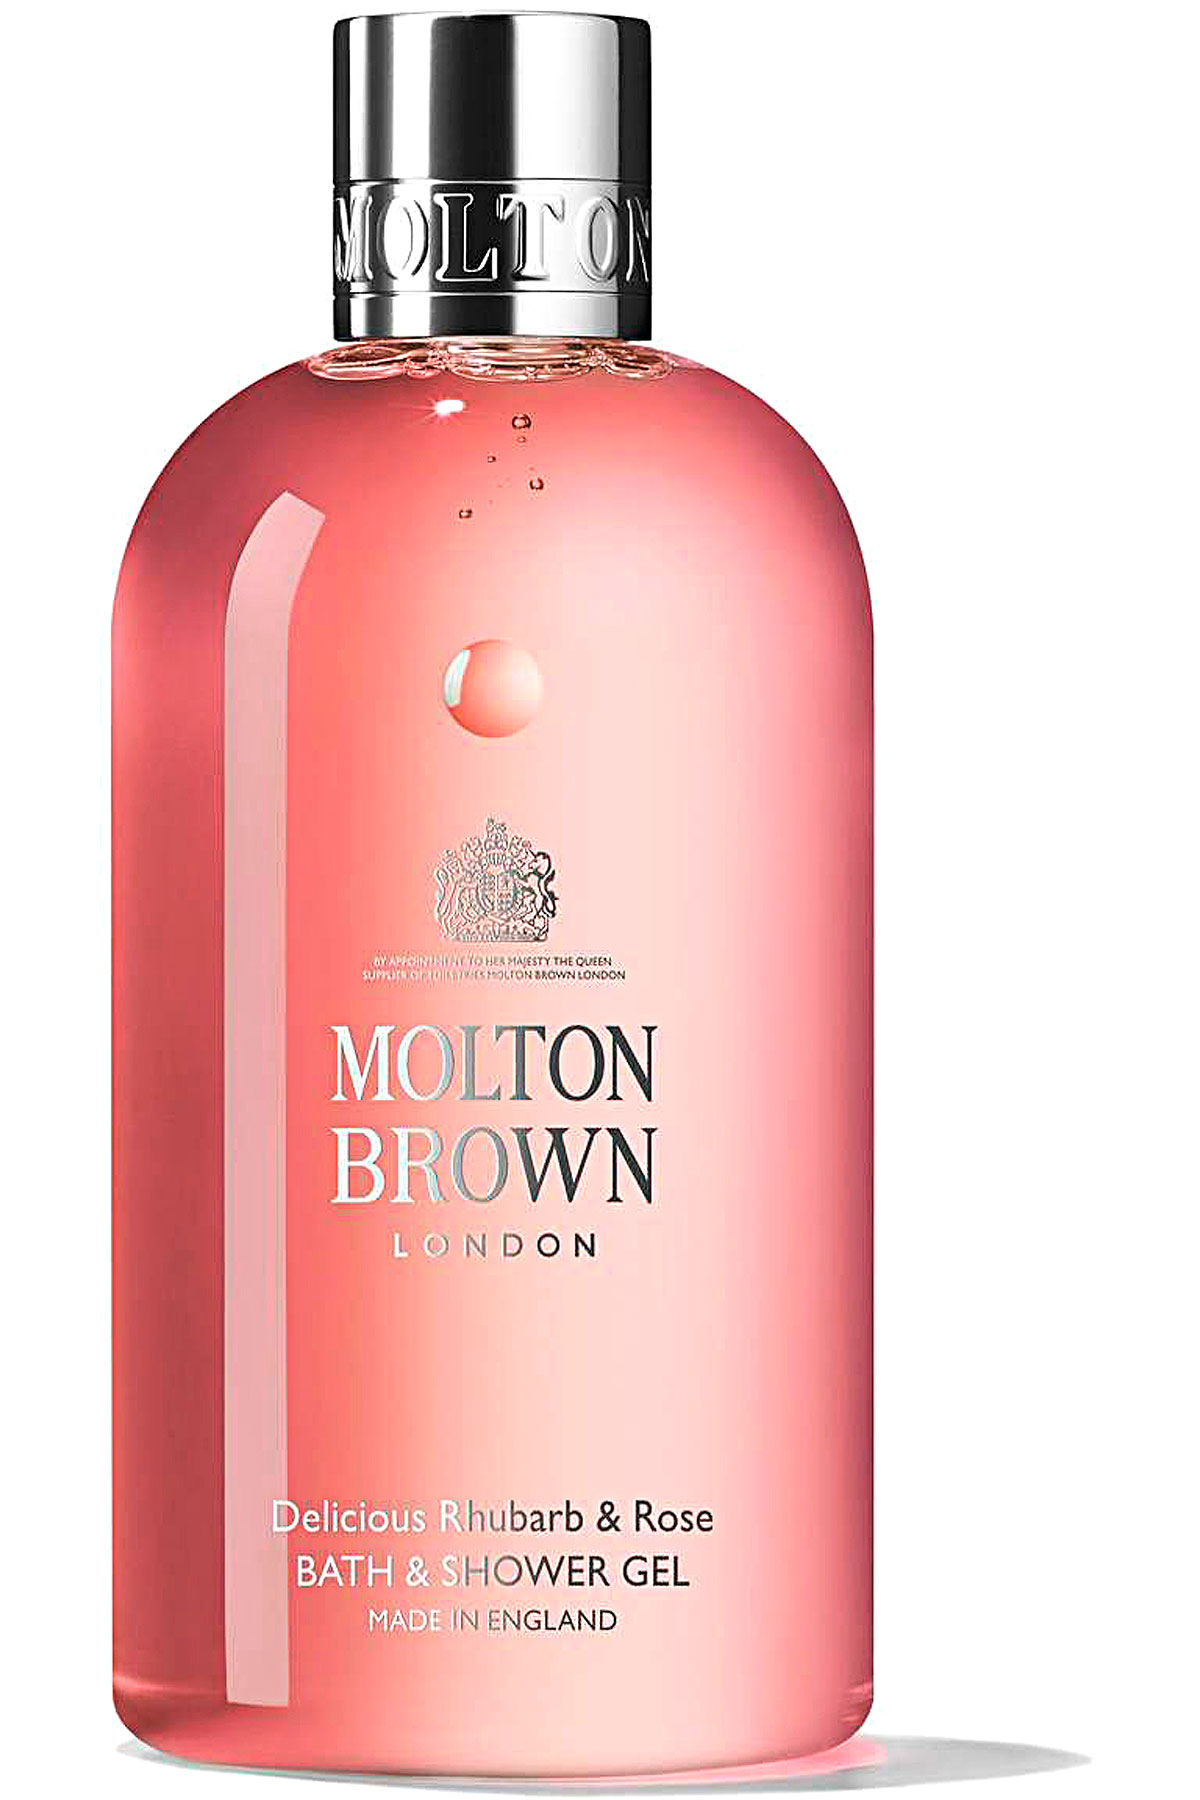 Molton Brown Beauty for Women, Delicious Rhubarb & Rose - Bath & Shower Gel - 300 Ml, 2019, 300 ml